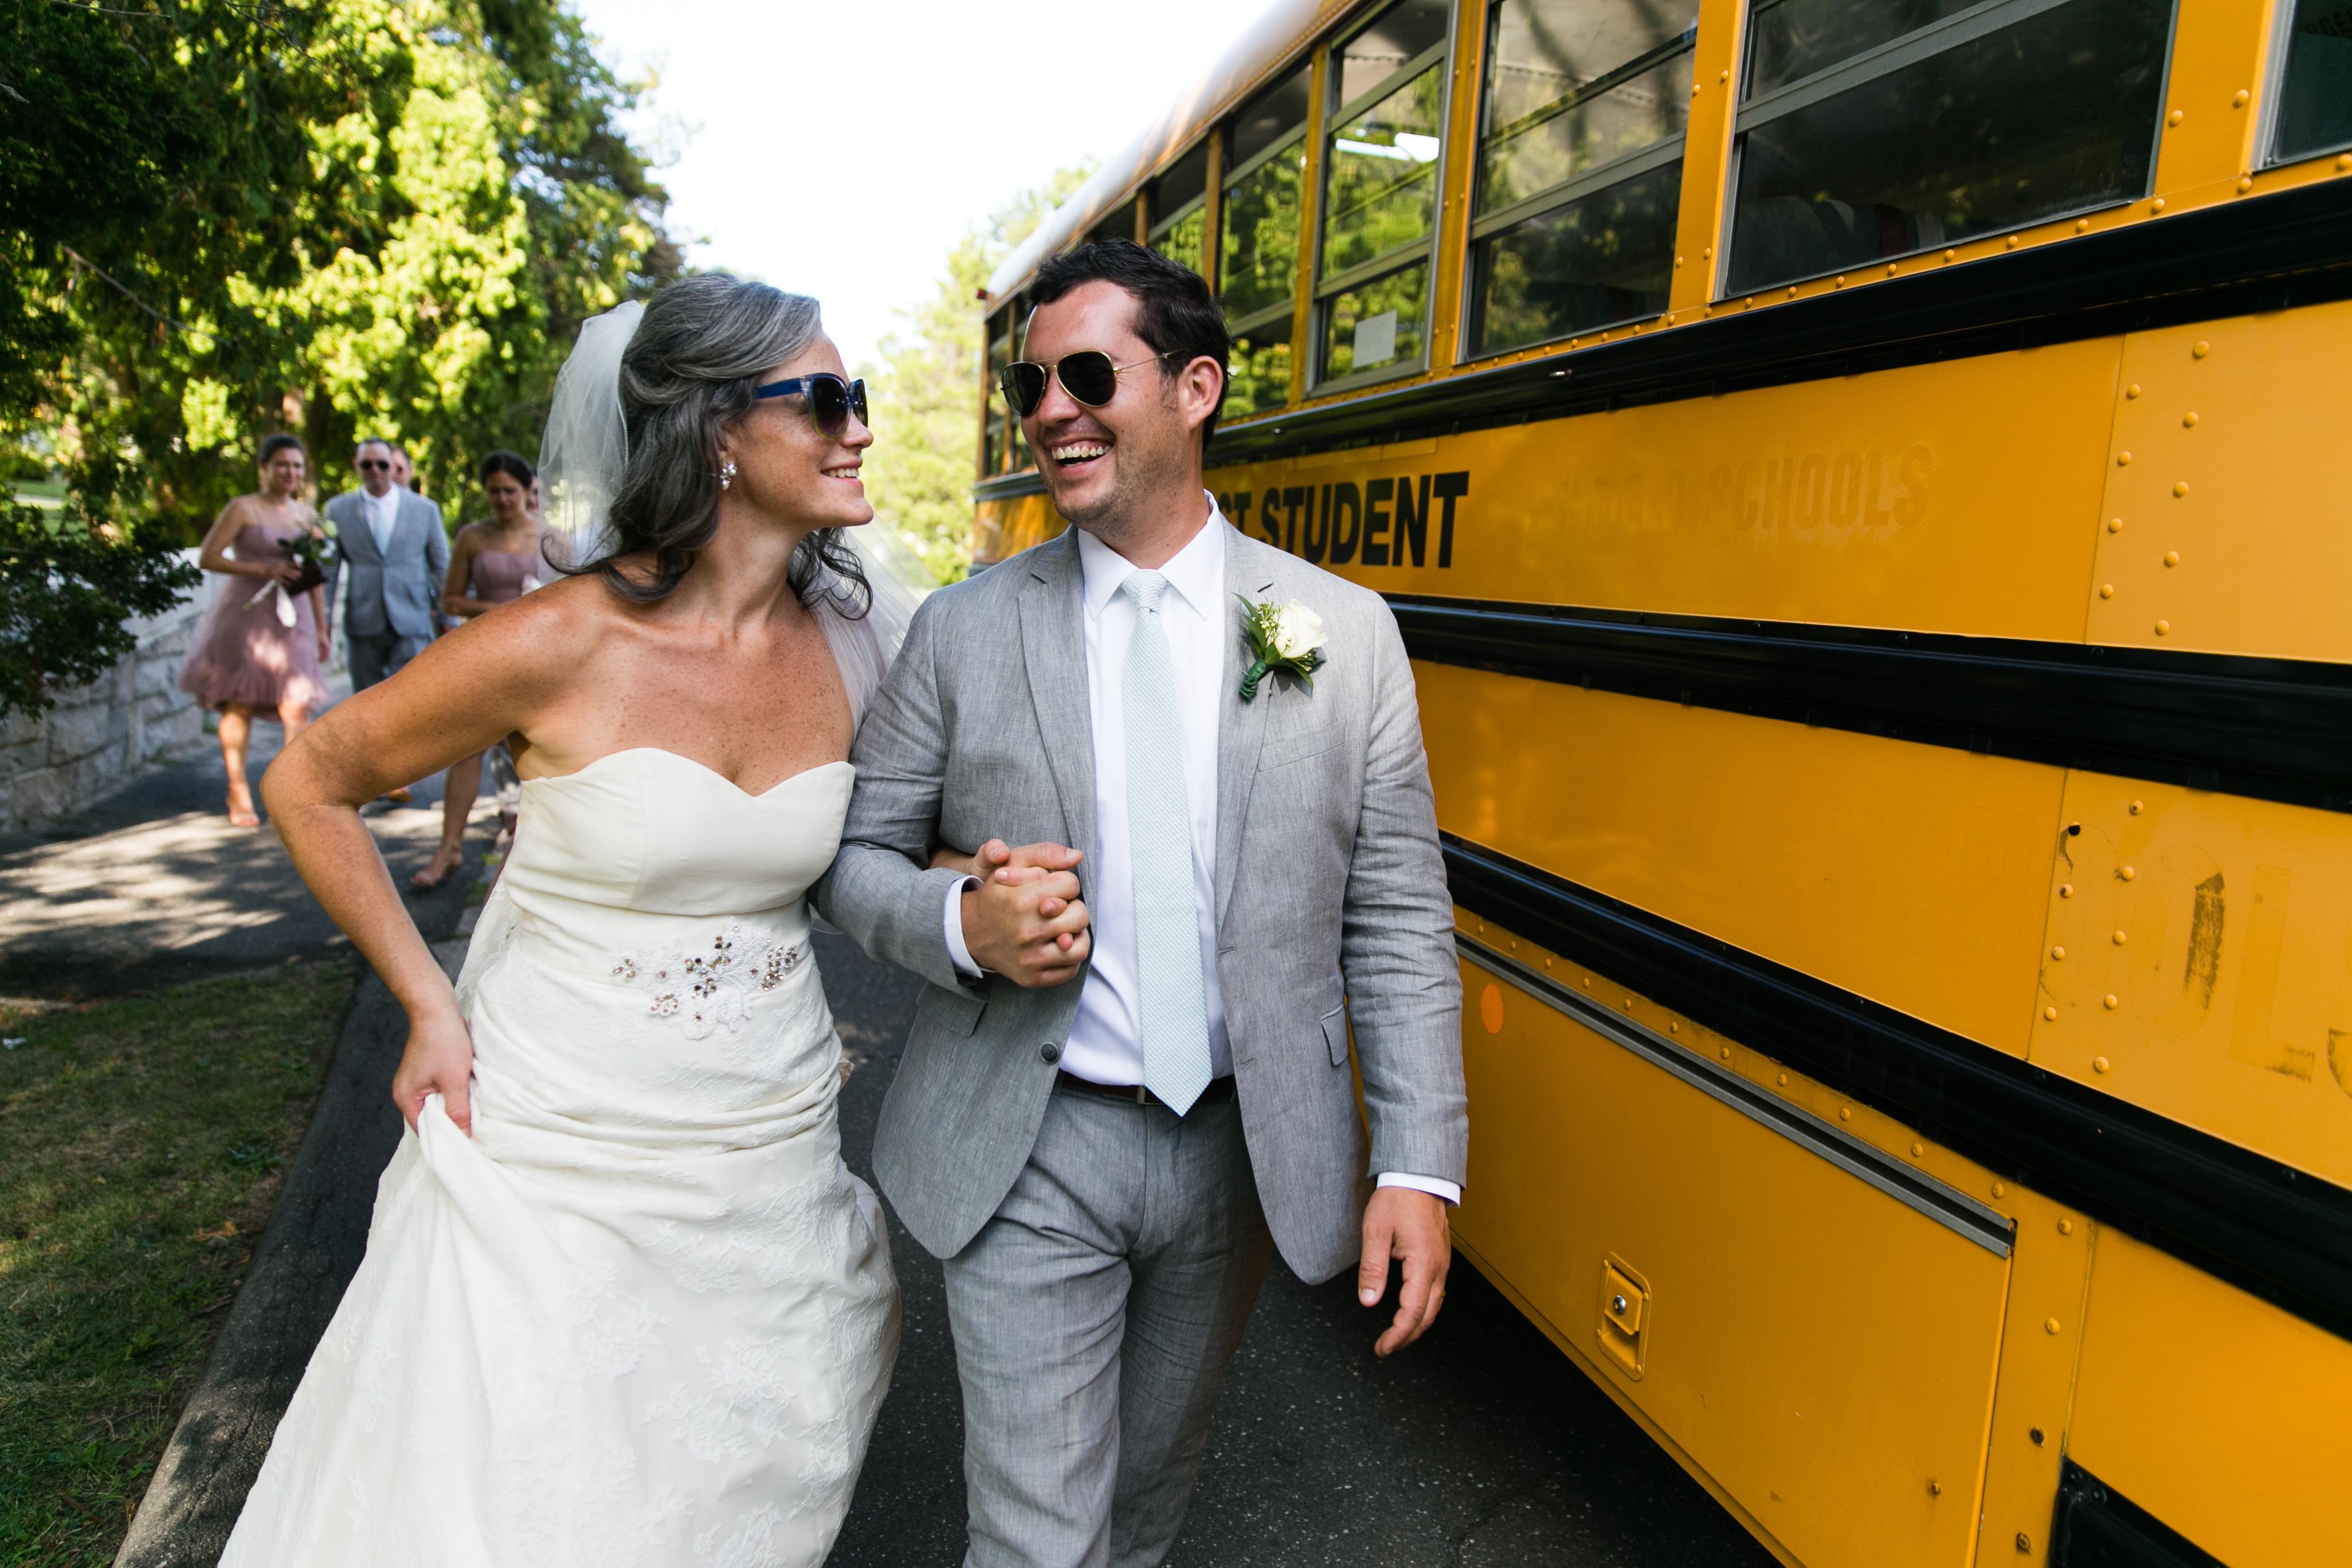 ct bride and groom outdoor wedding